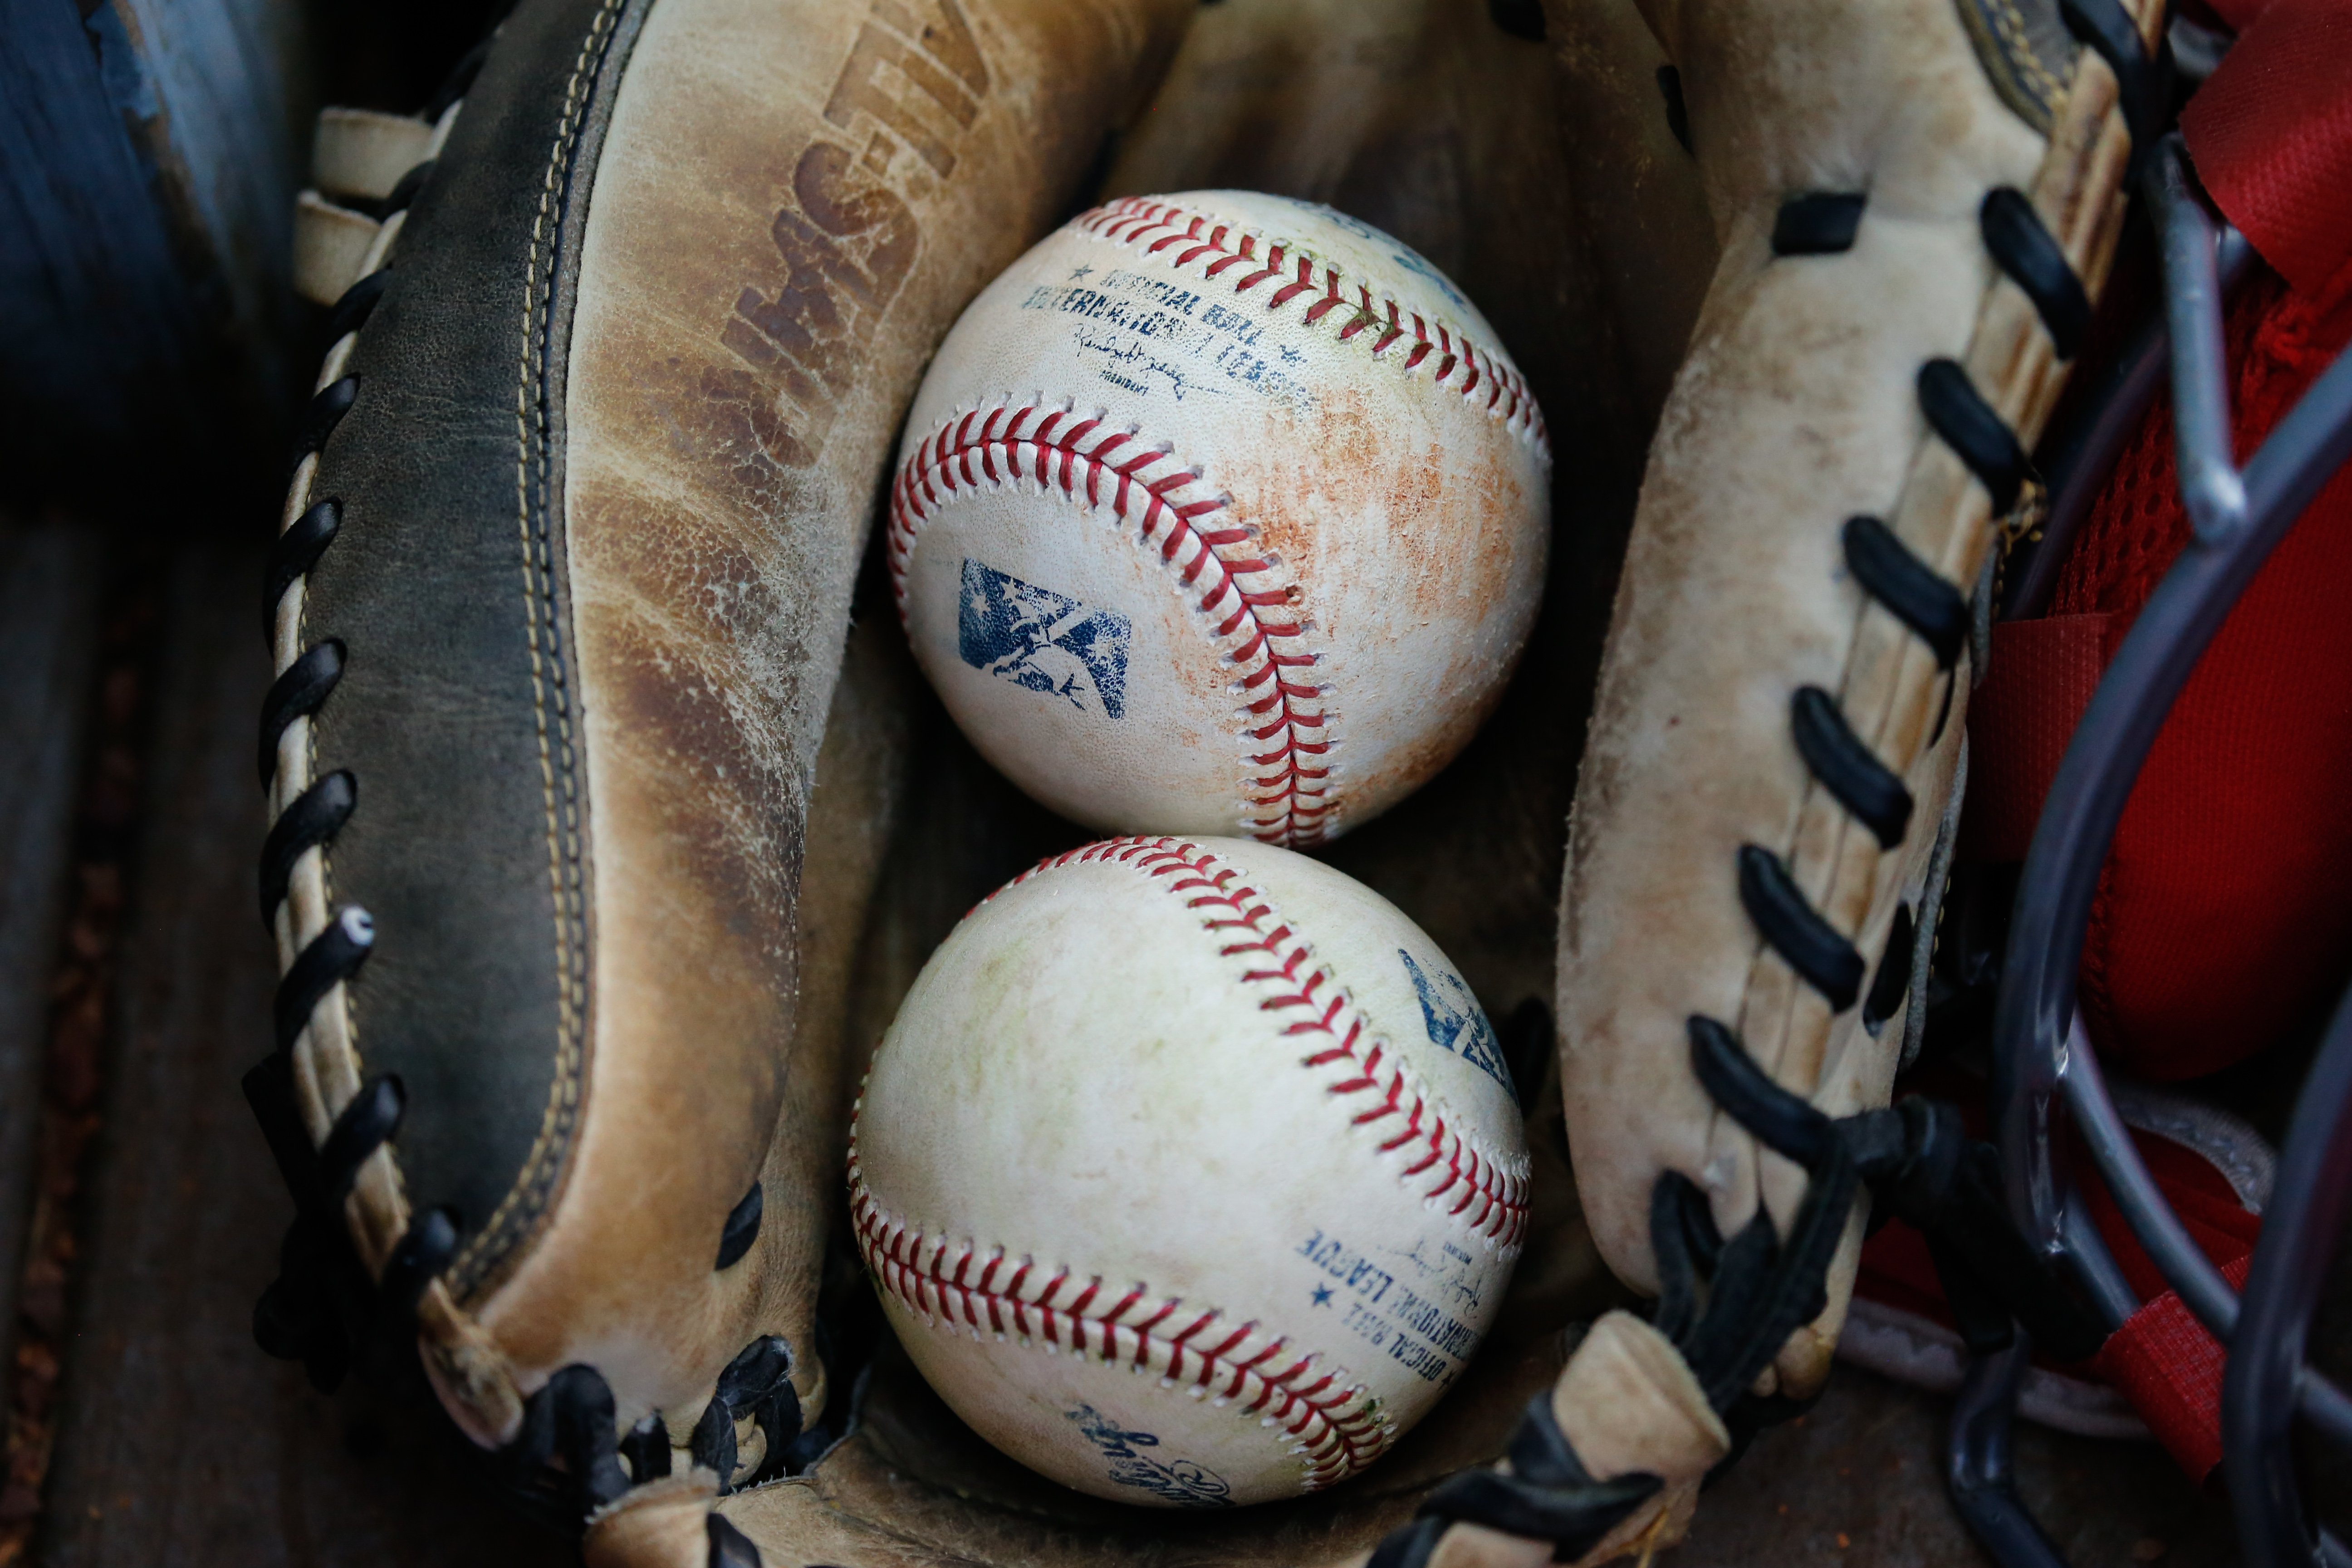 MiLB: JUL 30 Louisville Bats at Toledo Mud Hens